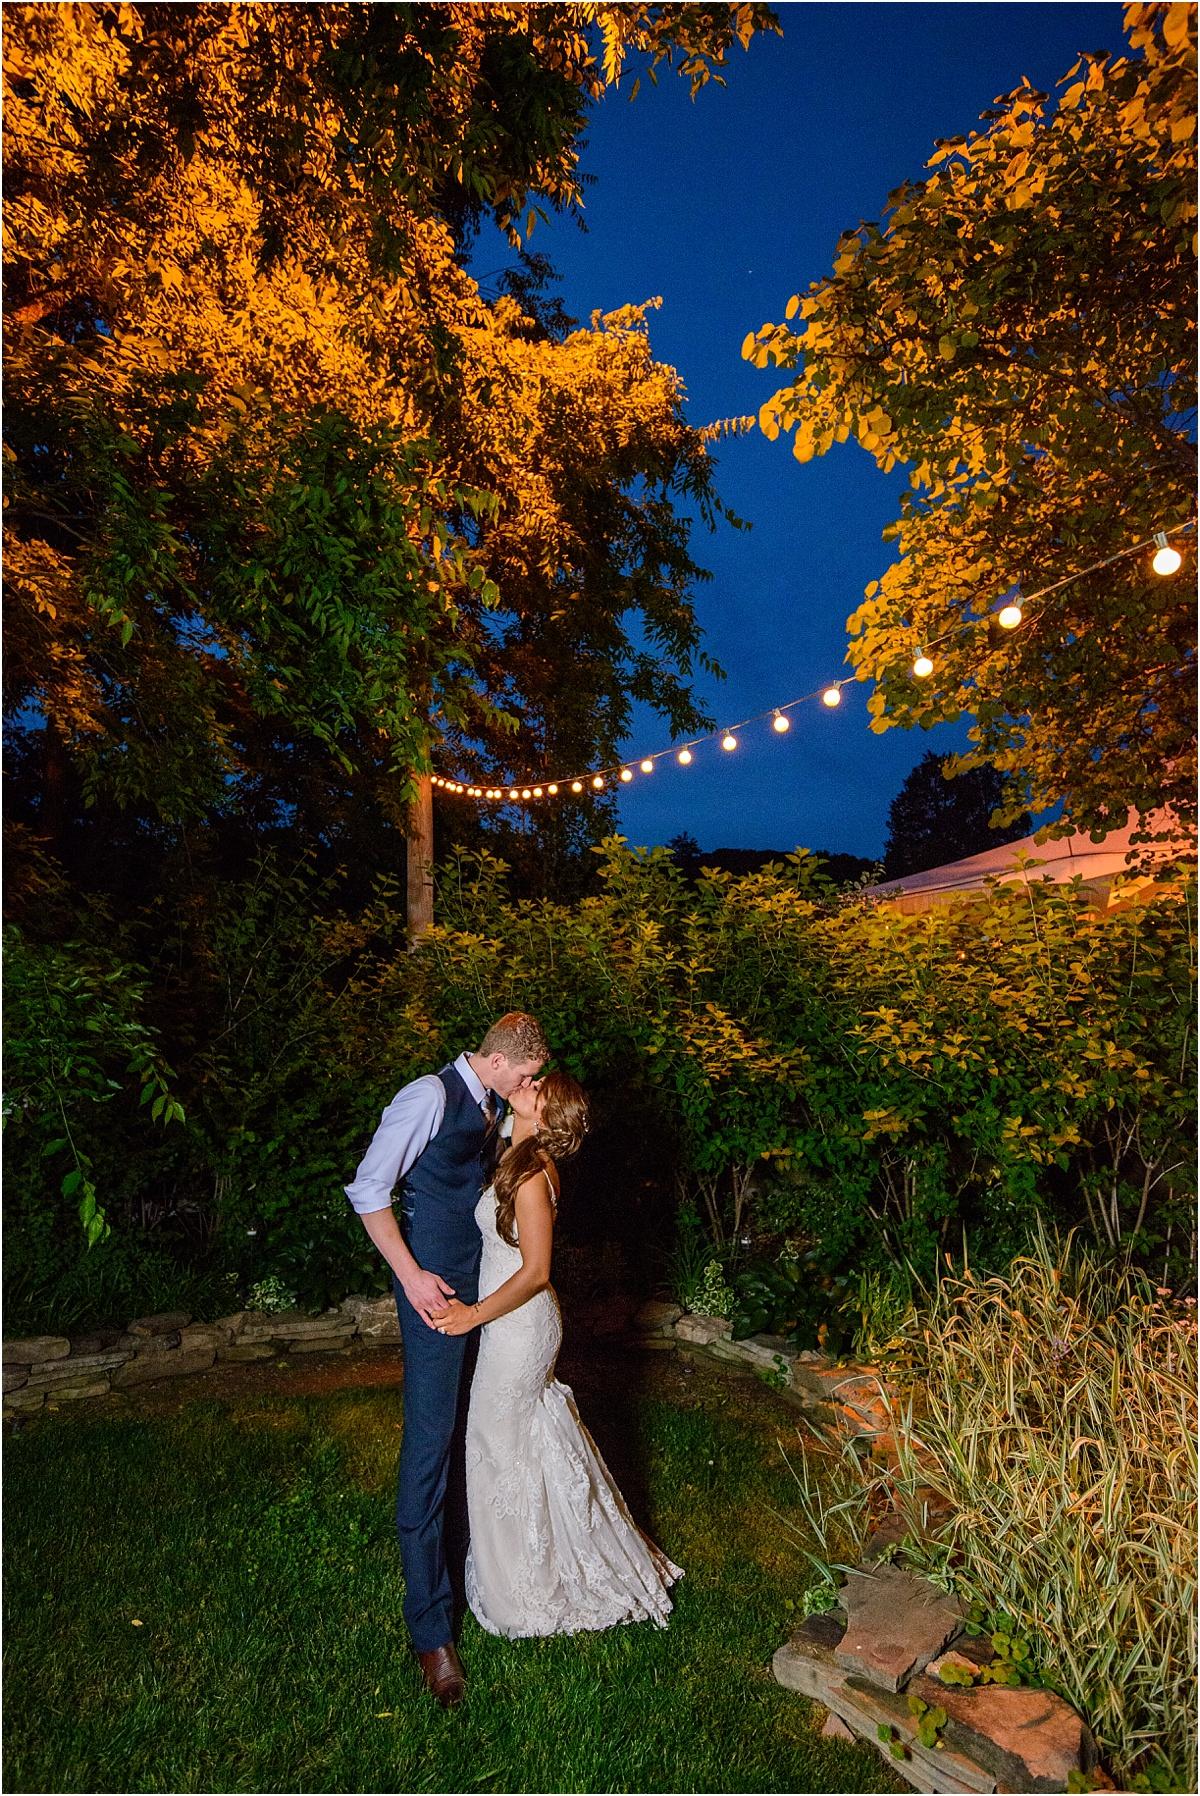 Greg Smit Photography Nashville wedding photographer Cedarwood Weddings_0057